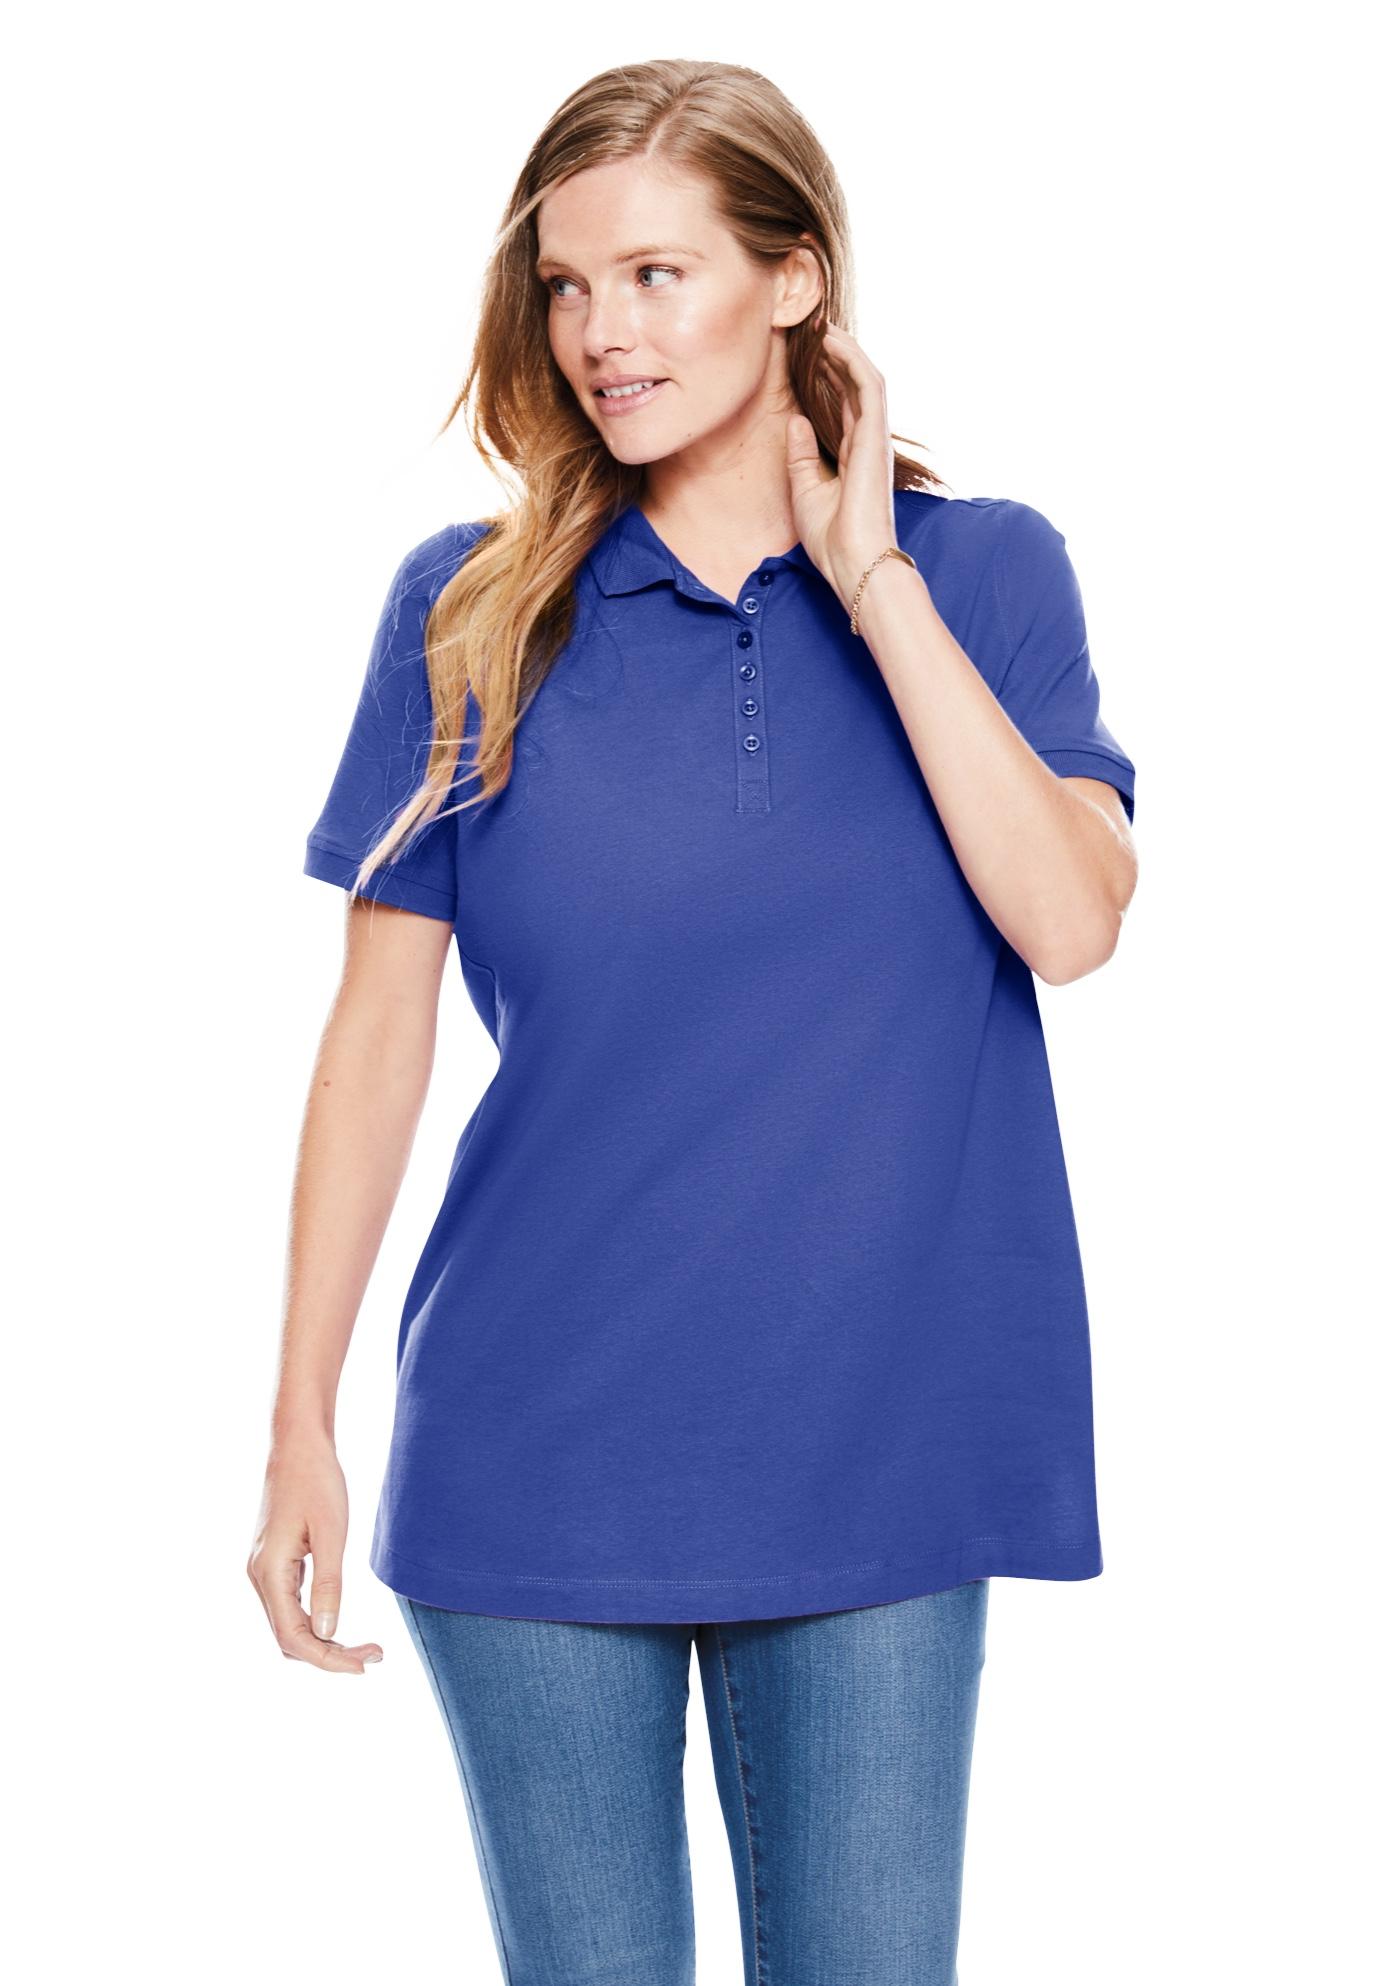 women's plus size navy blue polo shirts